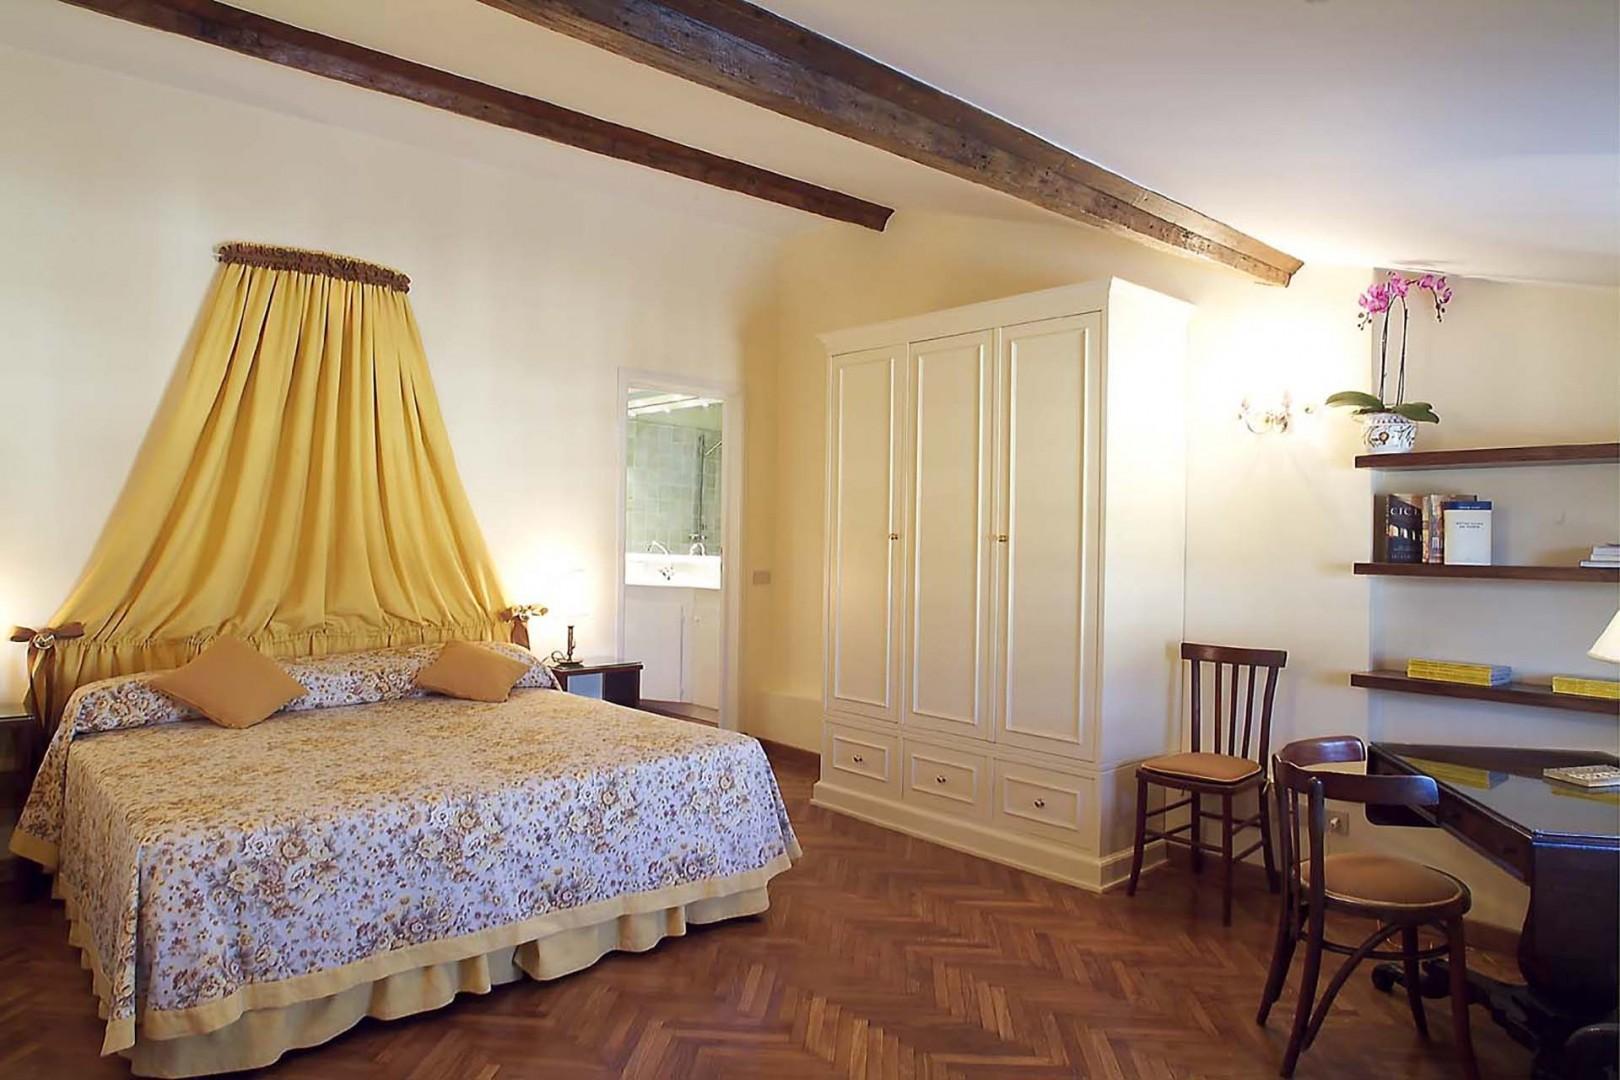 Large bedroom 1 has an en suite bathroom. A private suite.